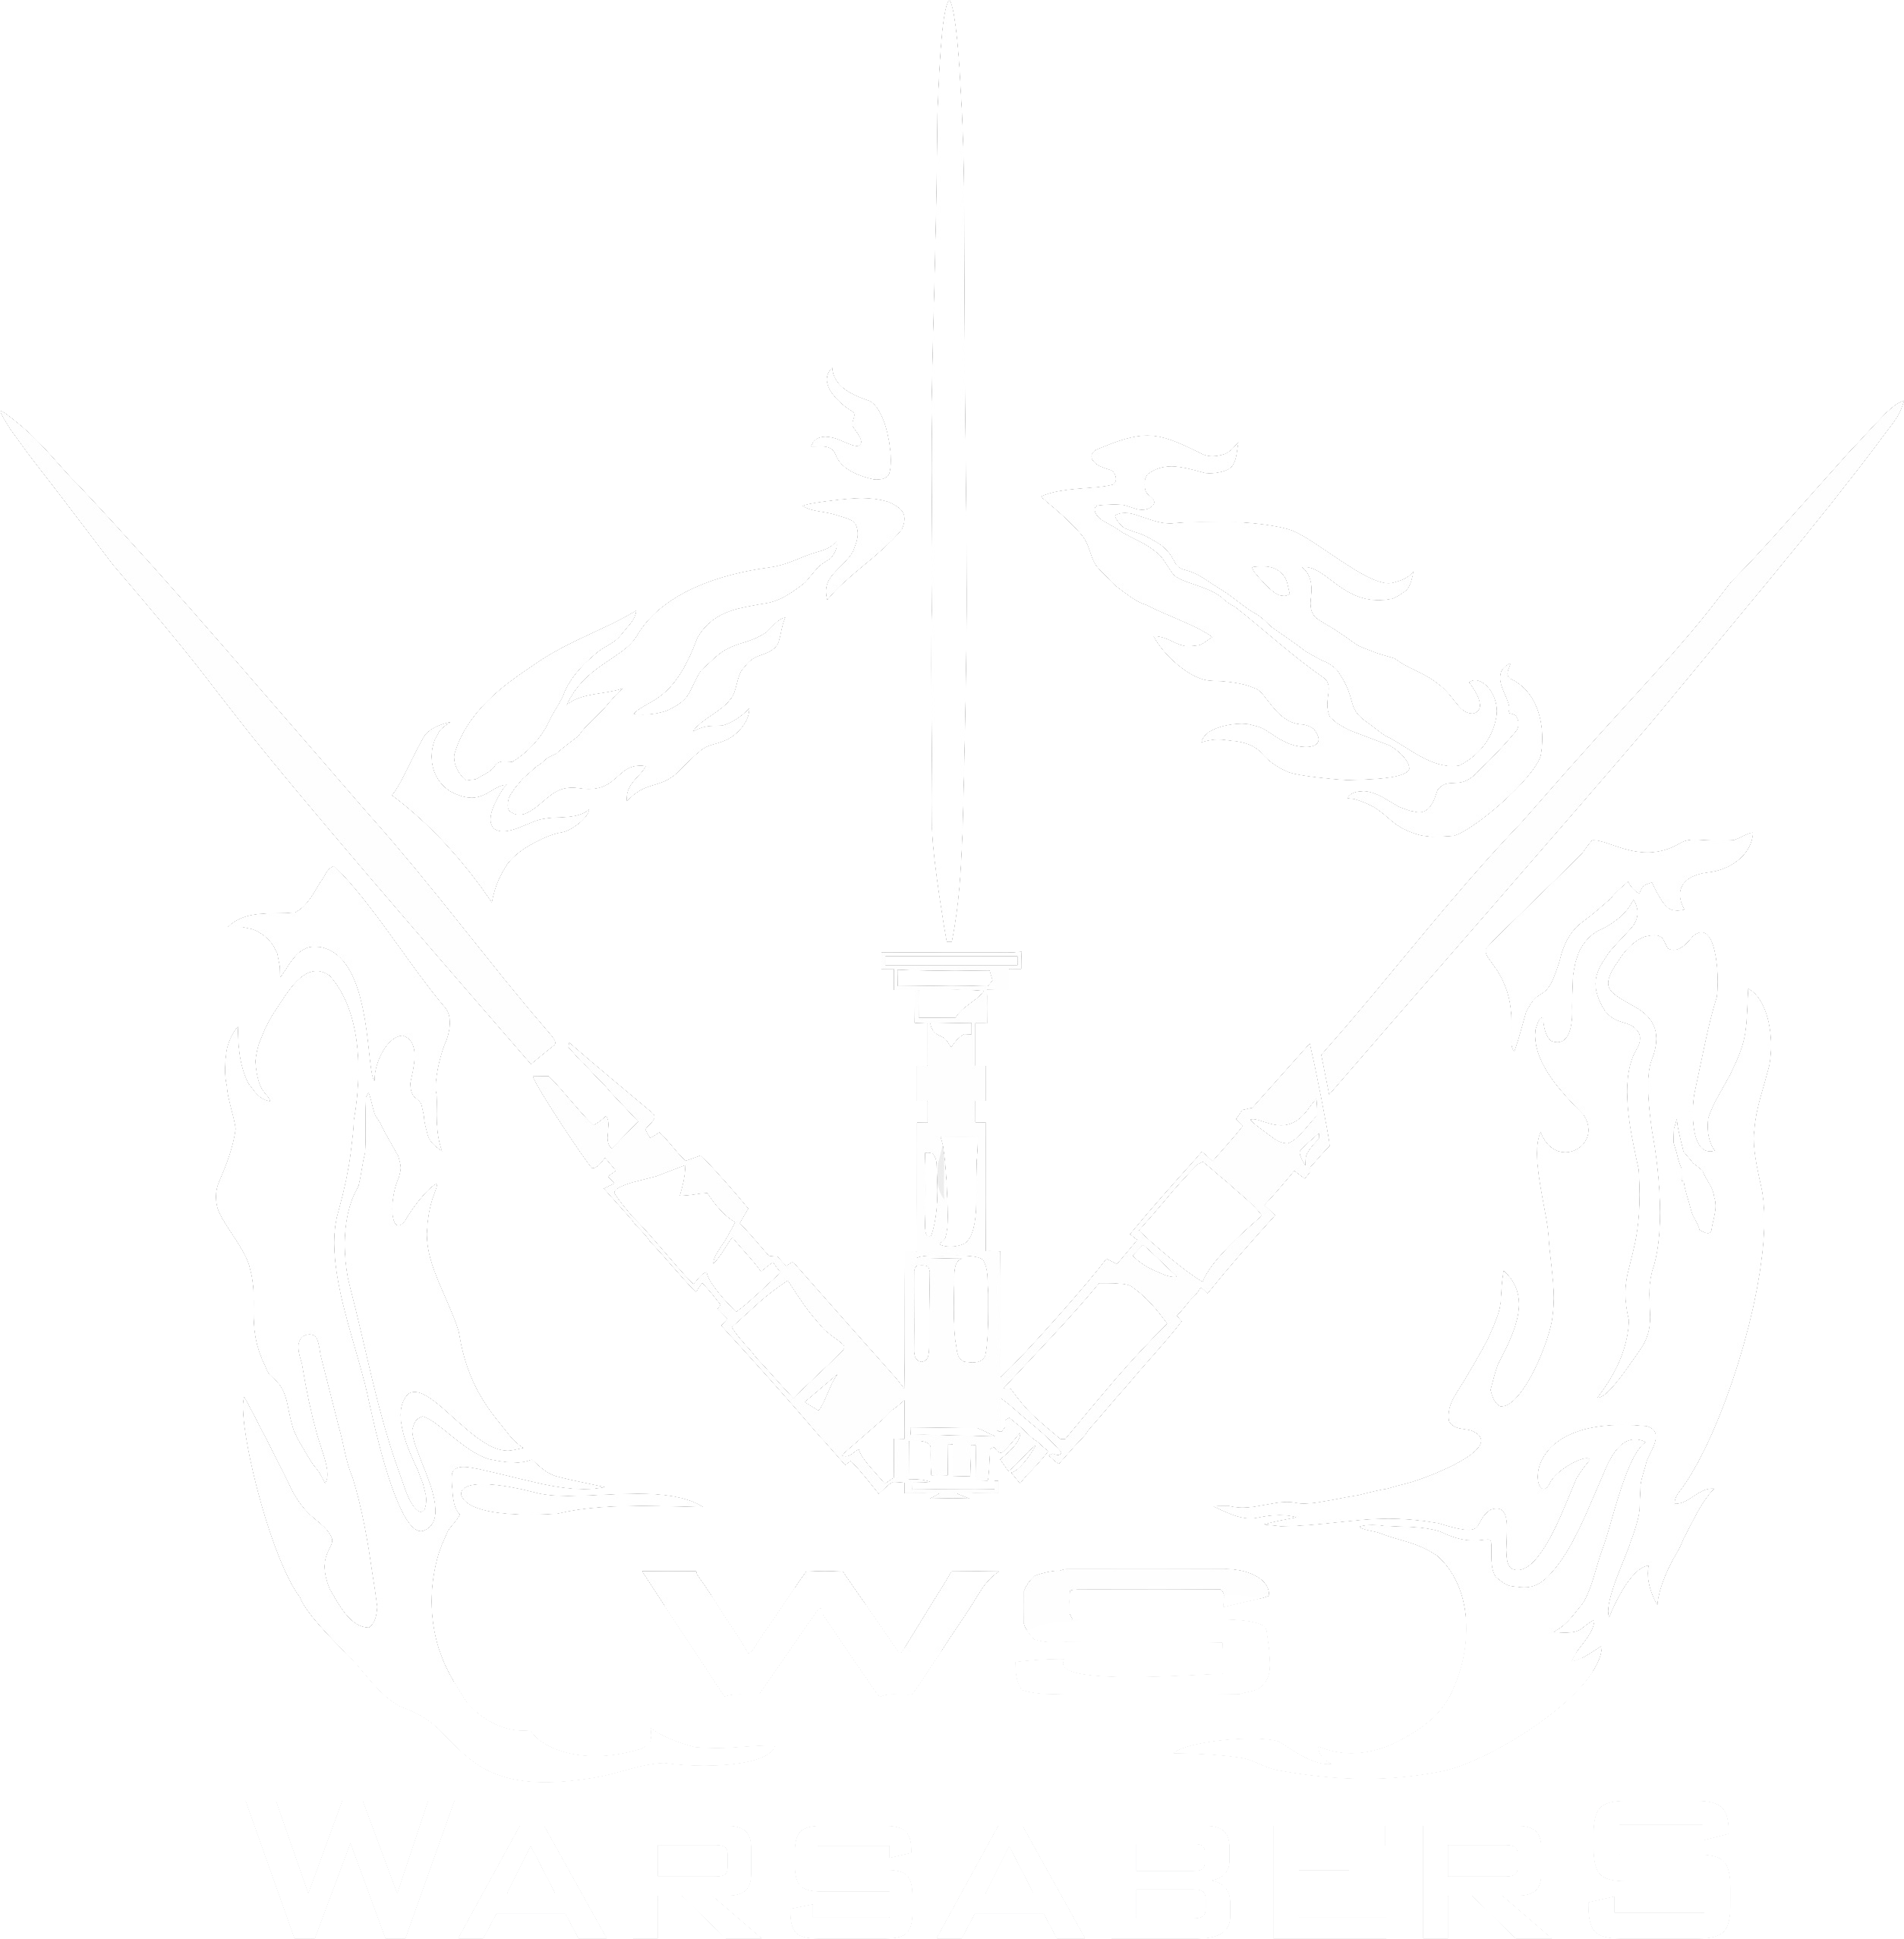 Warsabers